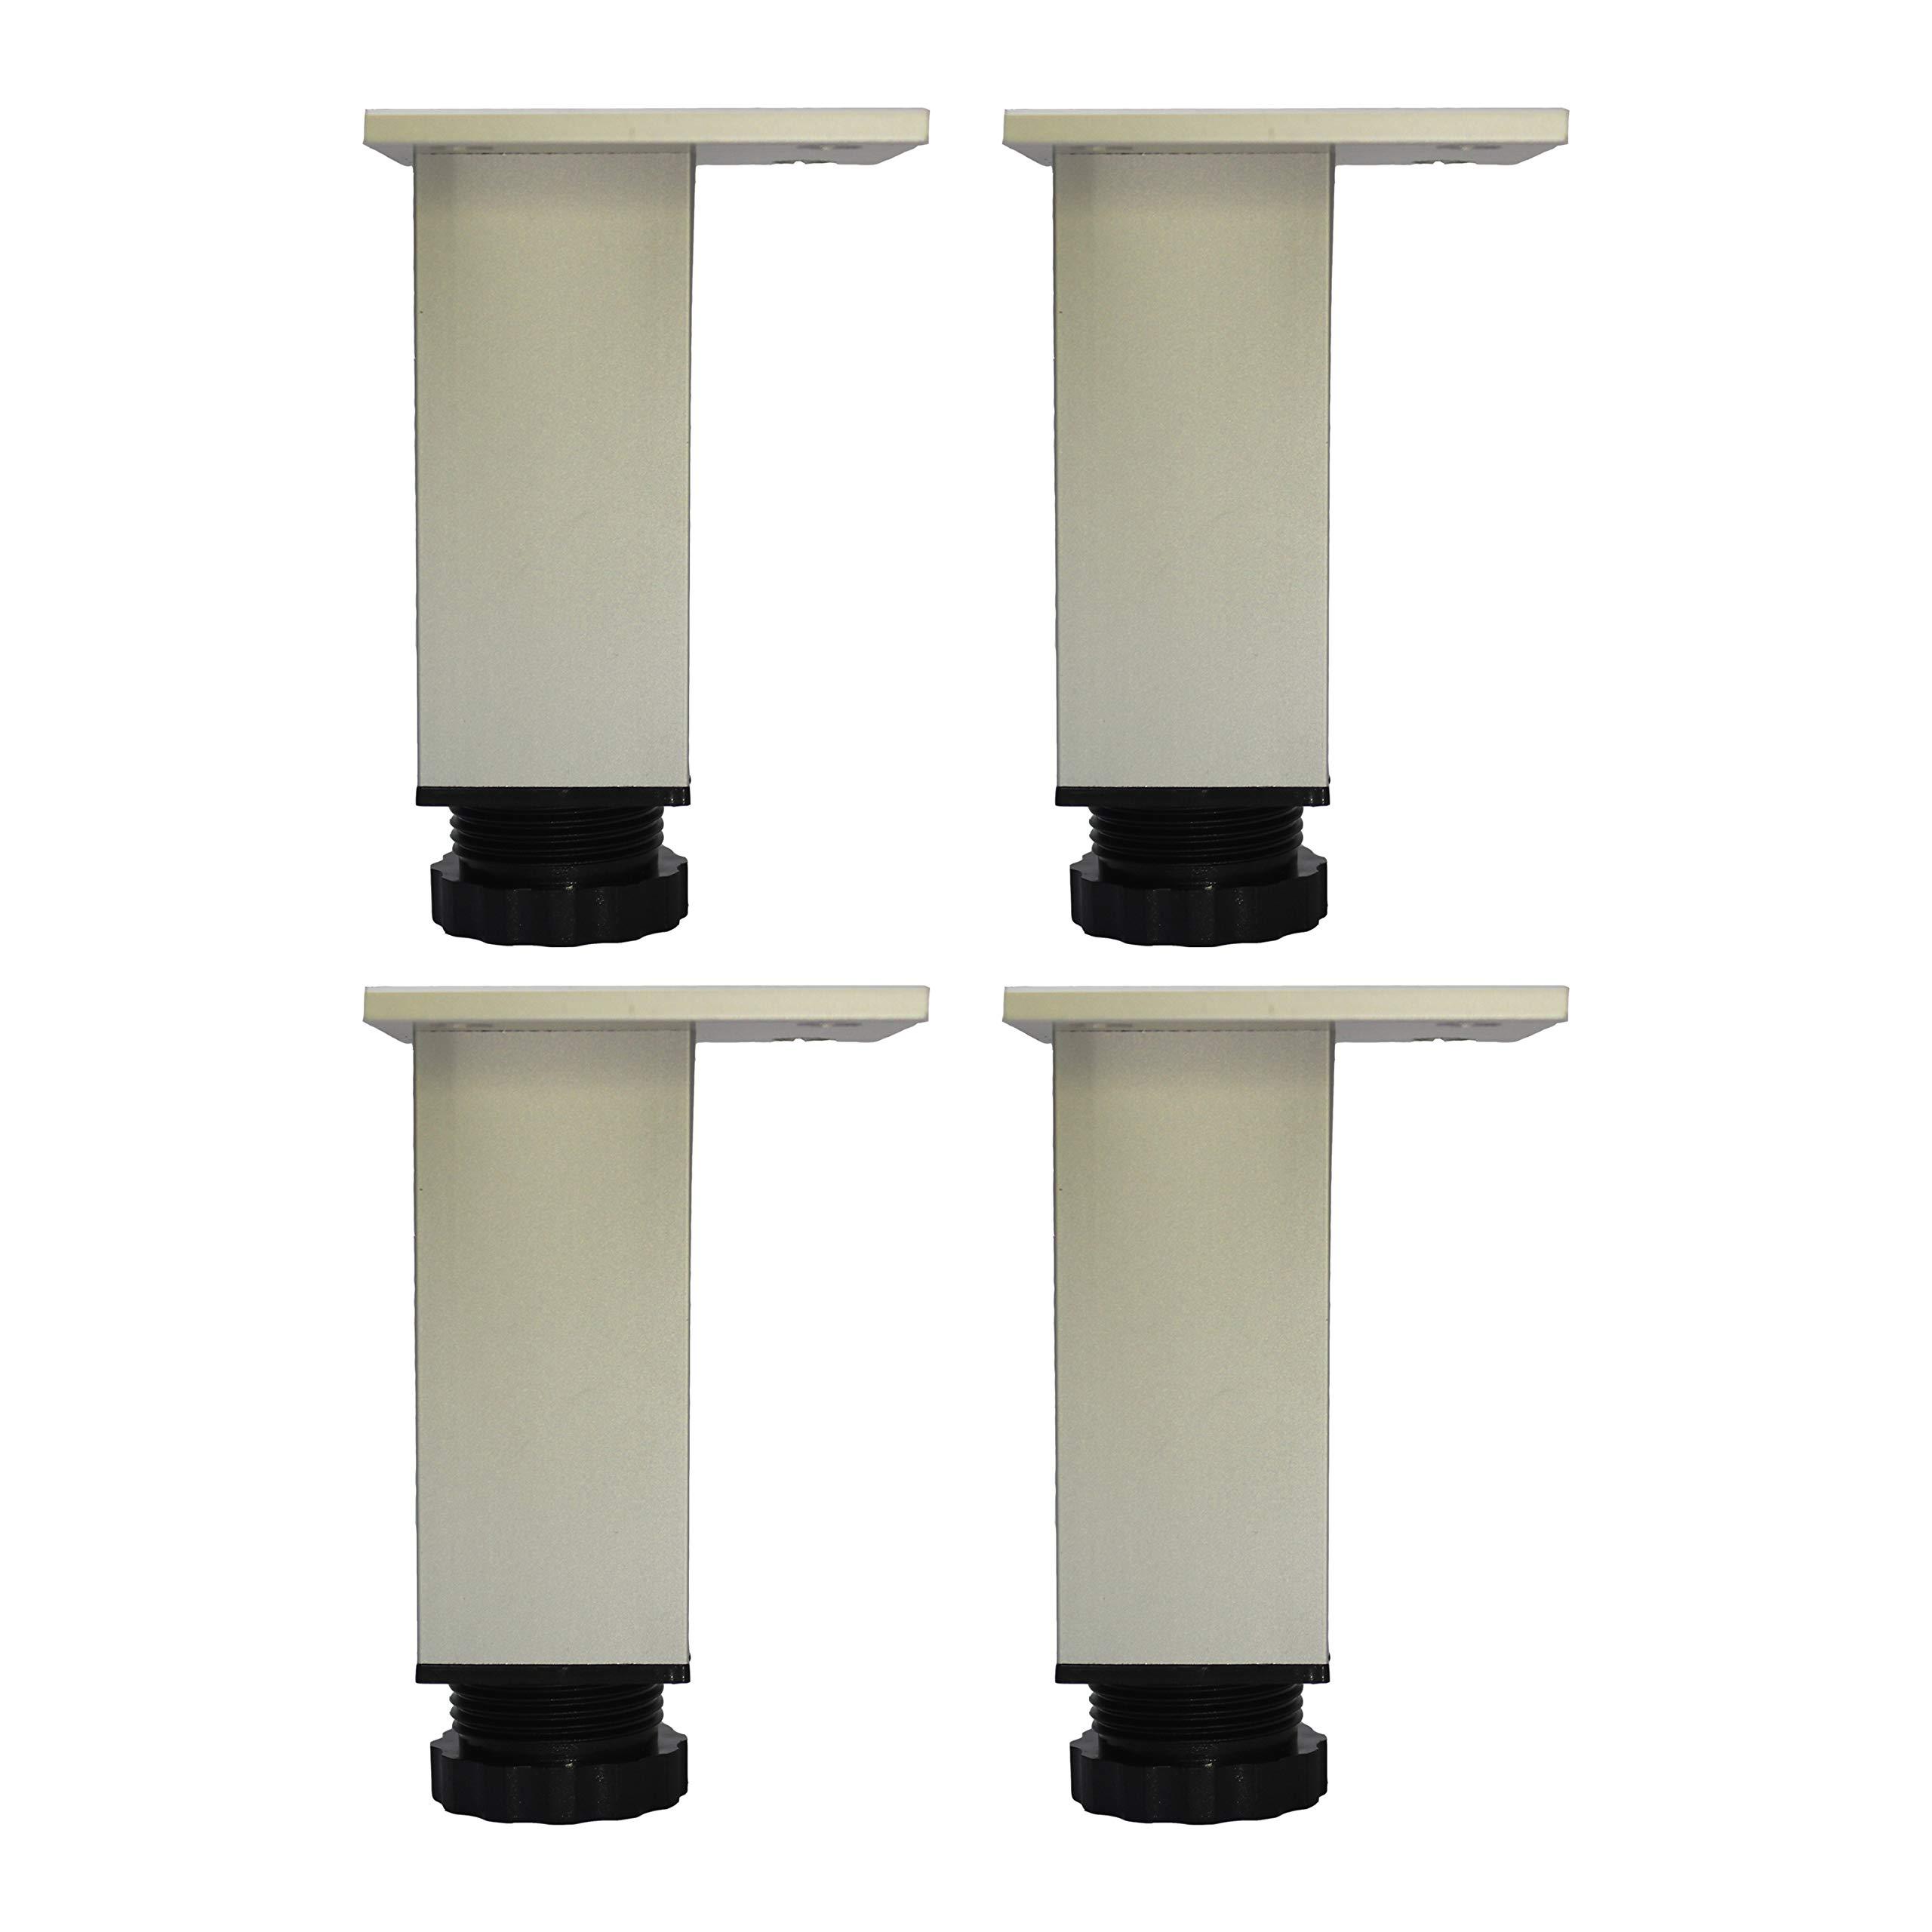 HUAYY Adjustment Height,Cabinet Aluminium Alloy Leveling Legs,Kitchen and Bathroom Use.